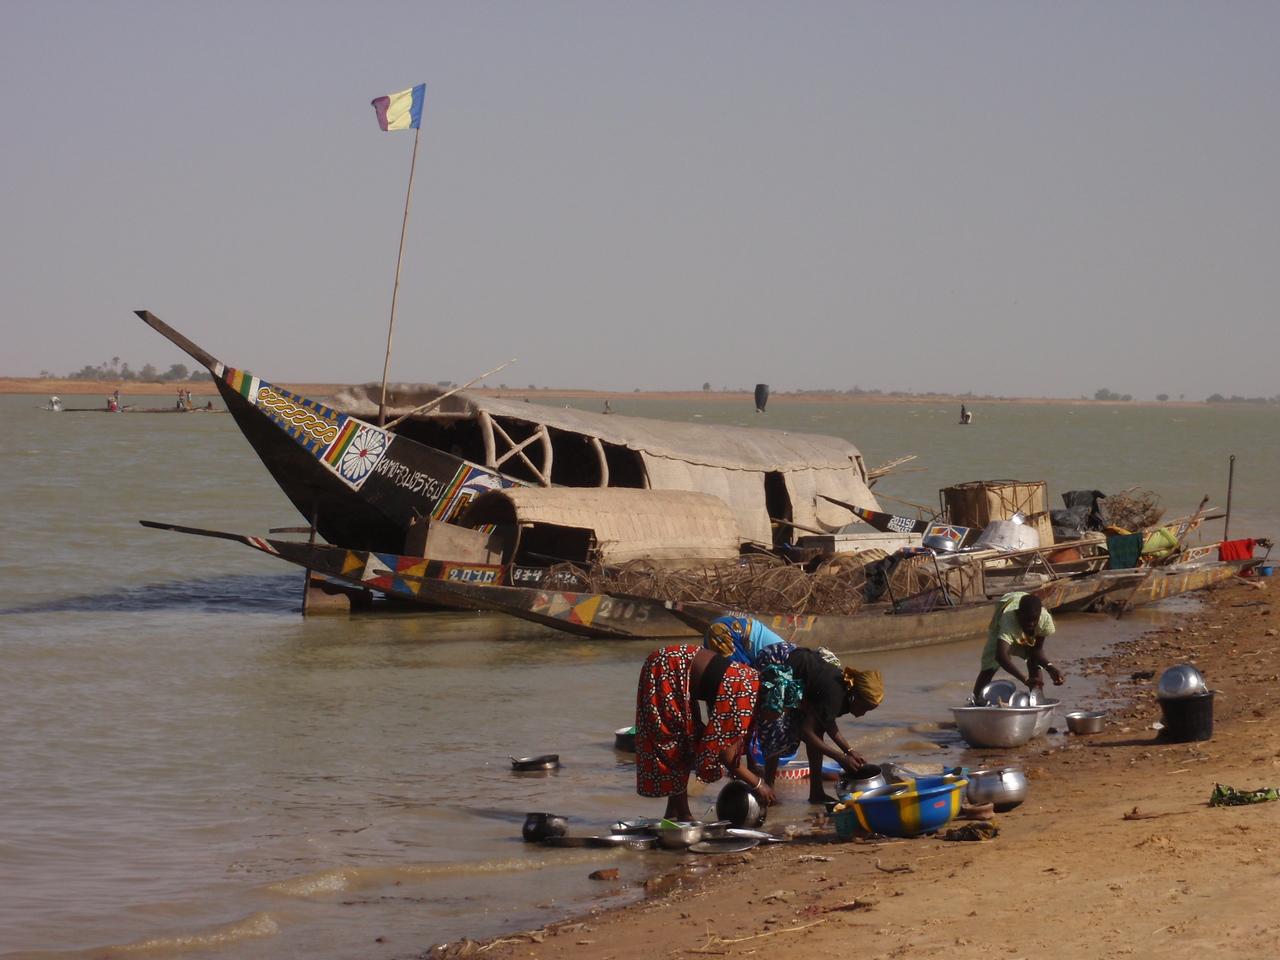 361_A Fishing Village  Fulani People  Women Washing Clothes